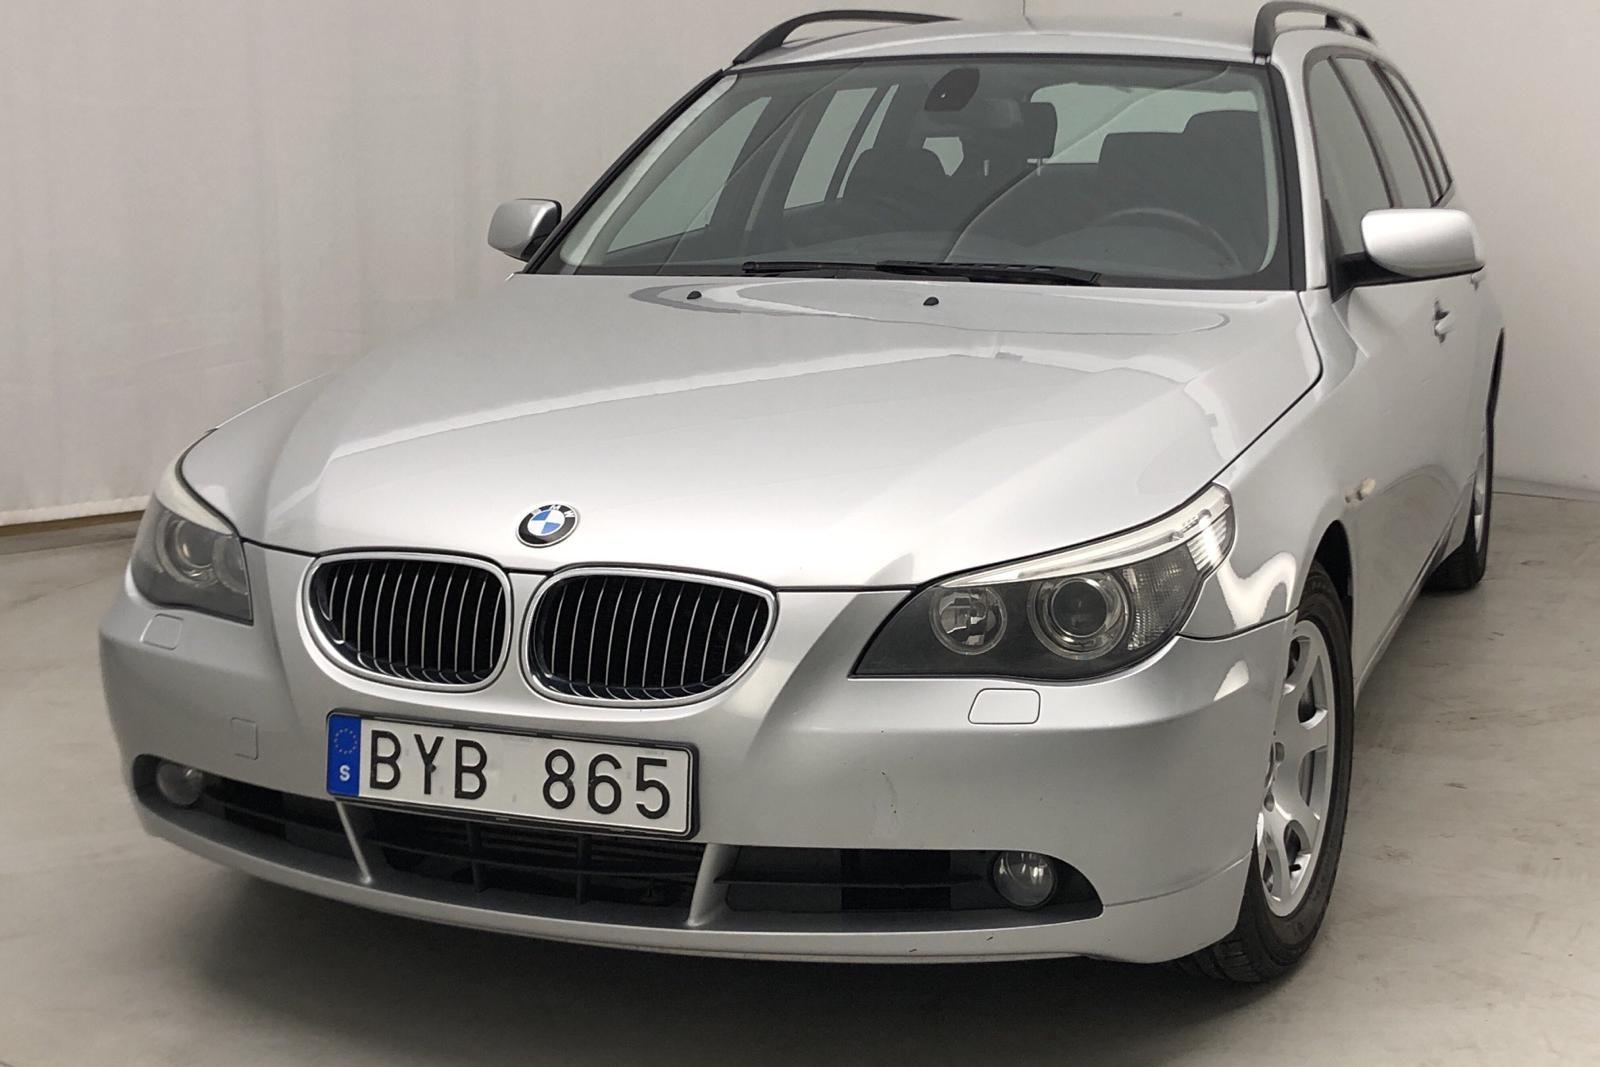 BMW 525d Touring, E61 (177 PS)